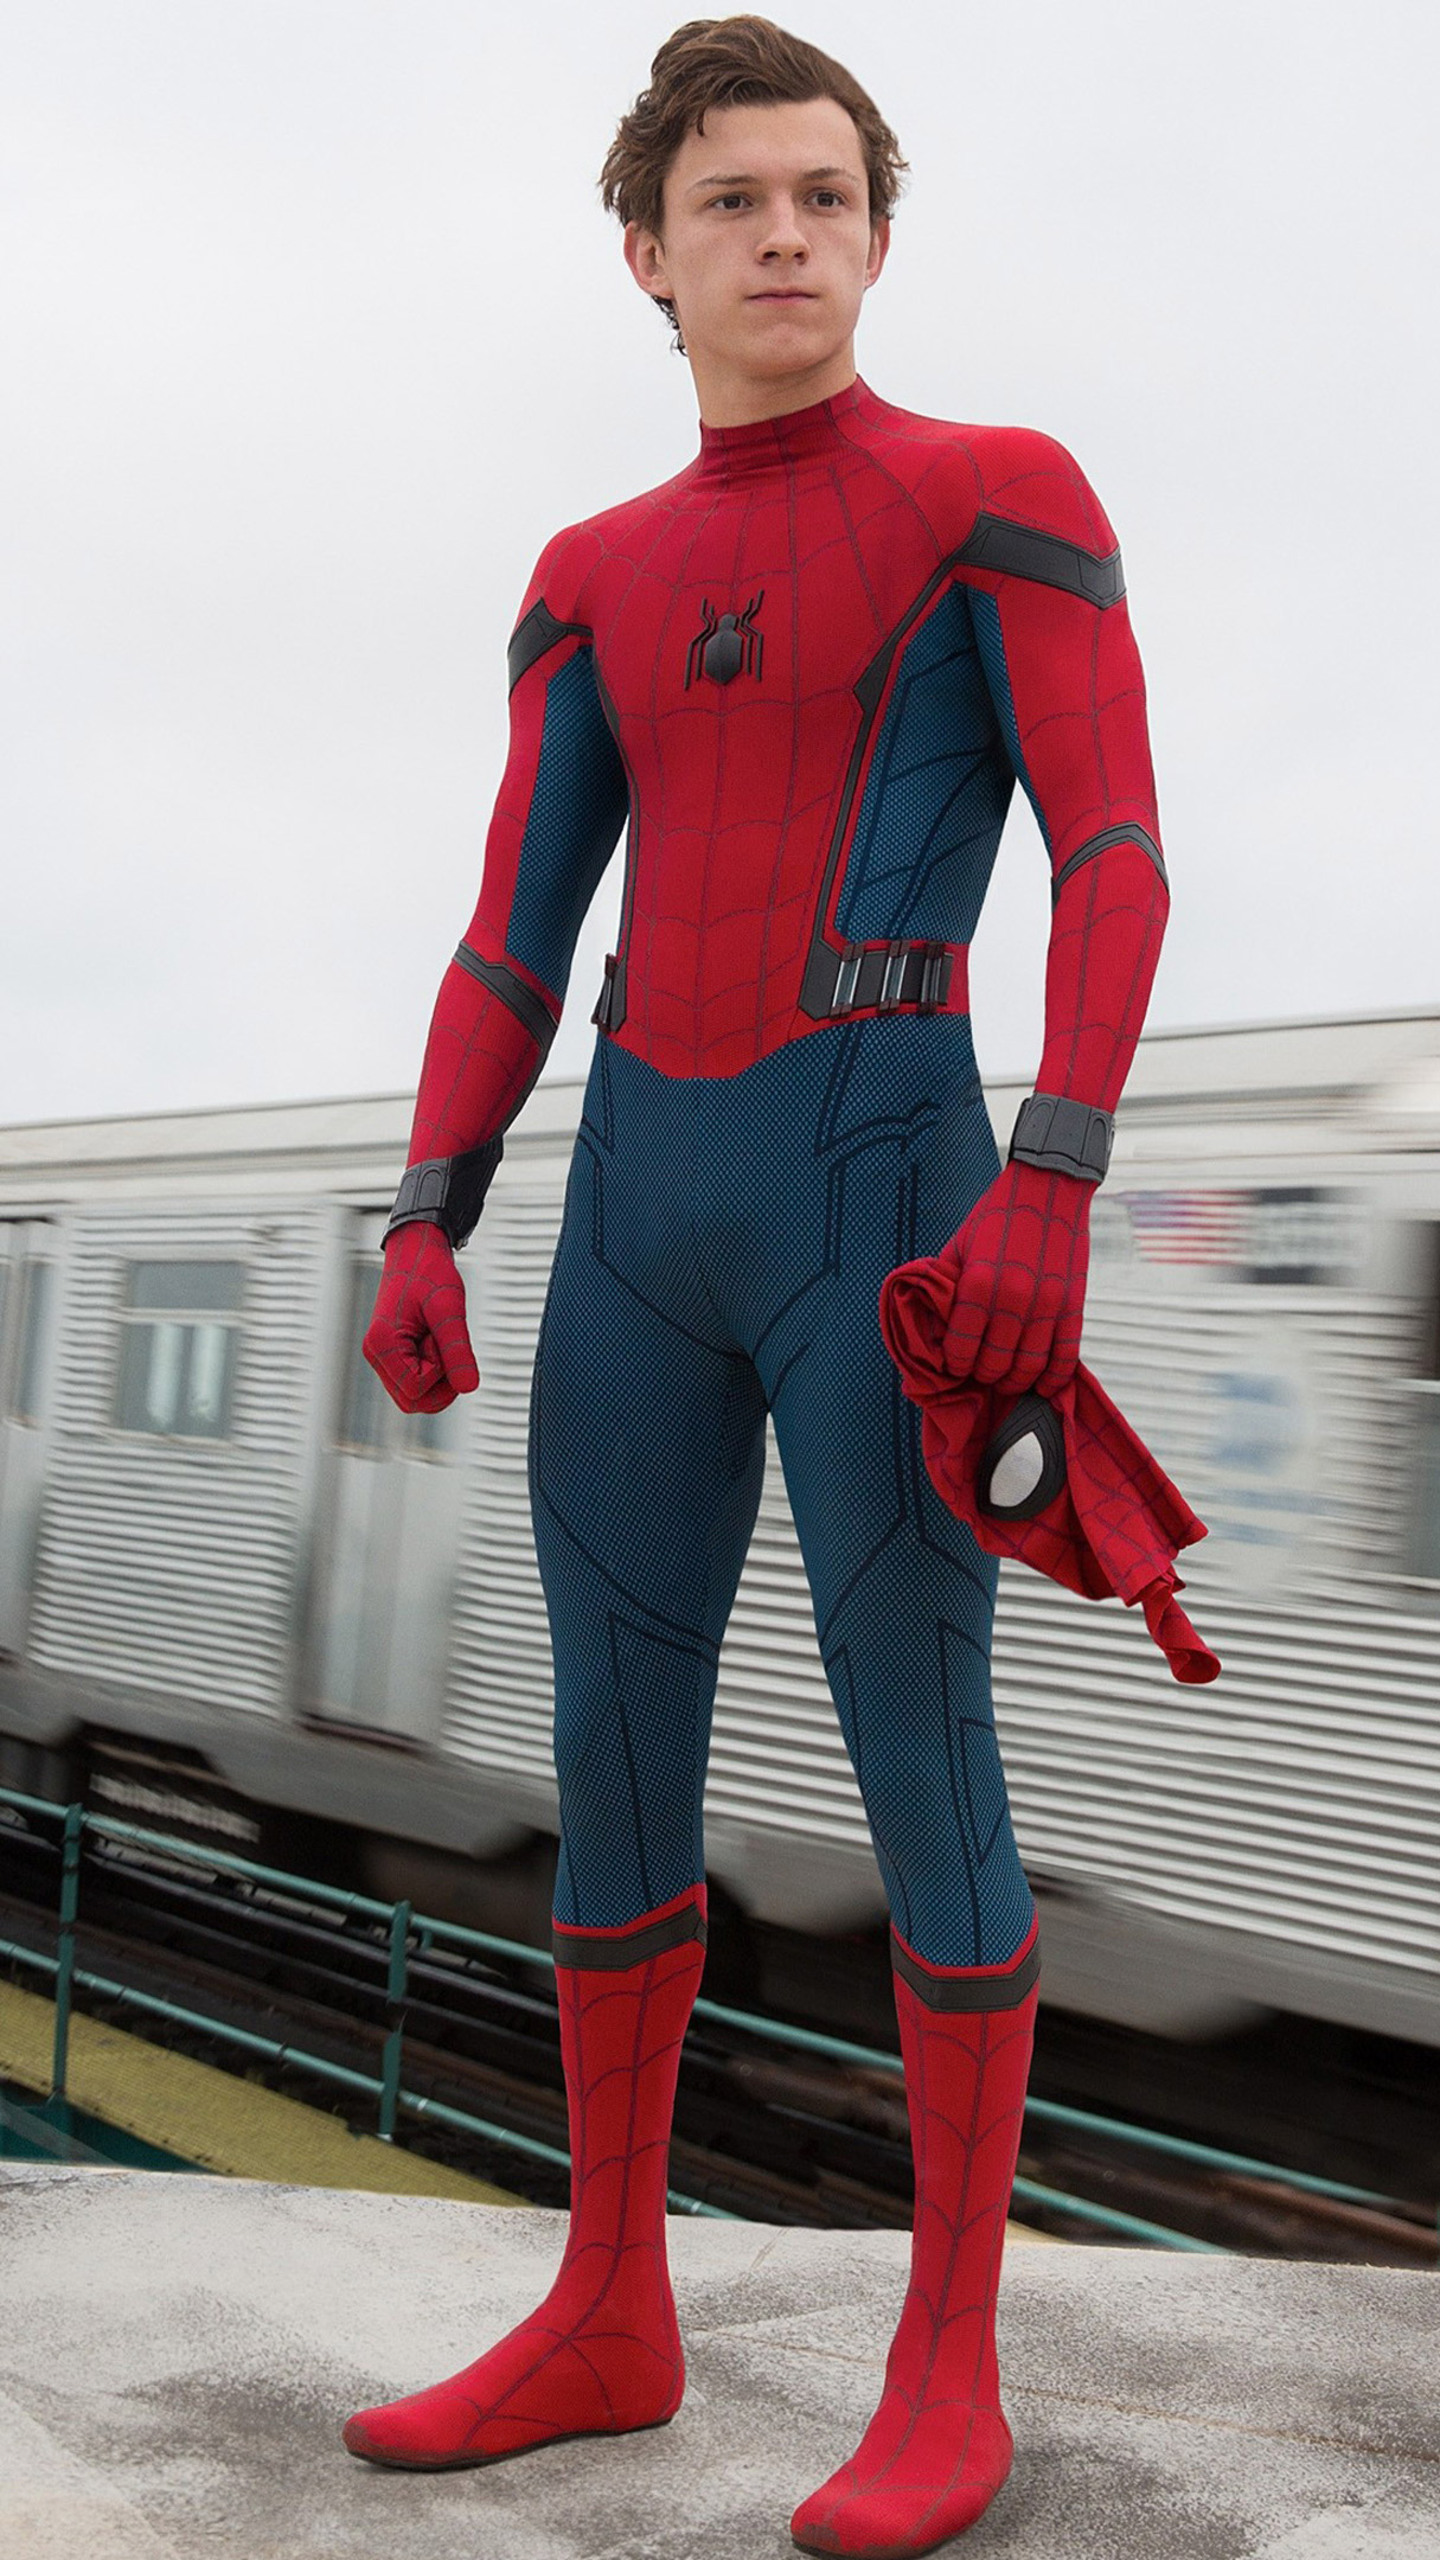 spiderman-homecoming-tom-holland-4k-2017-movie-ad.jpg